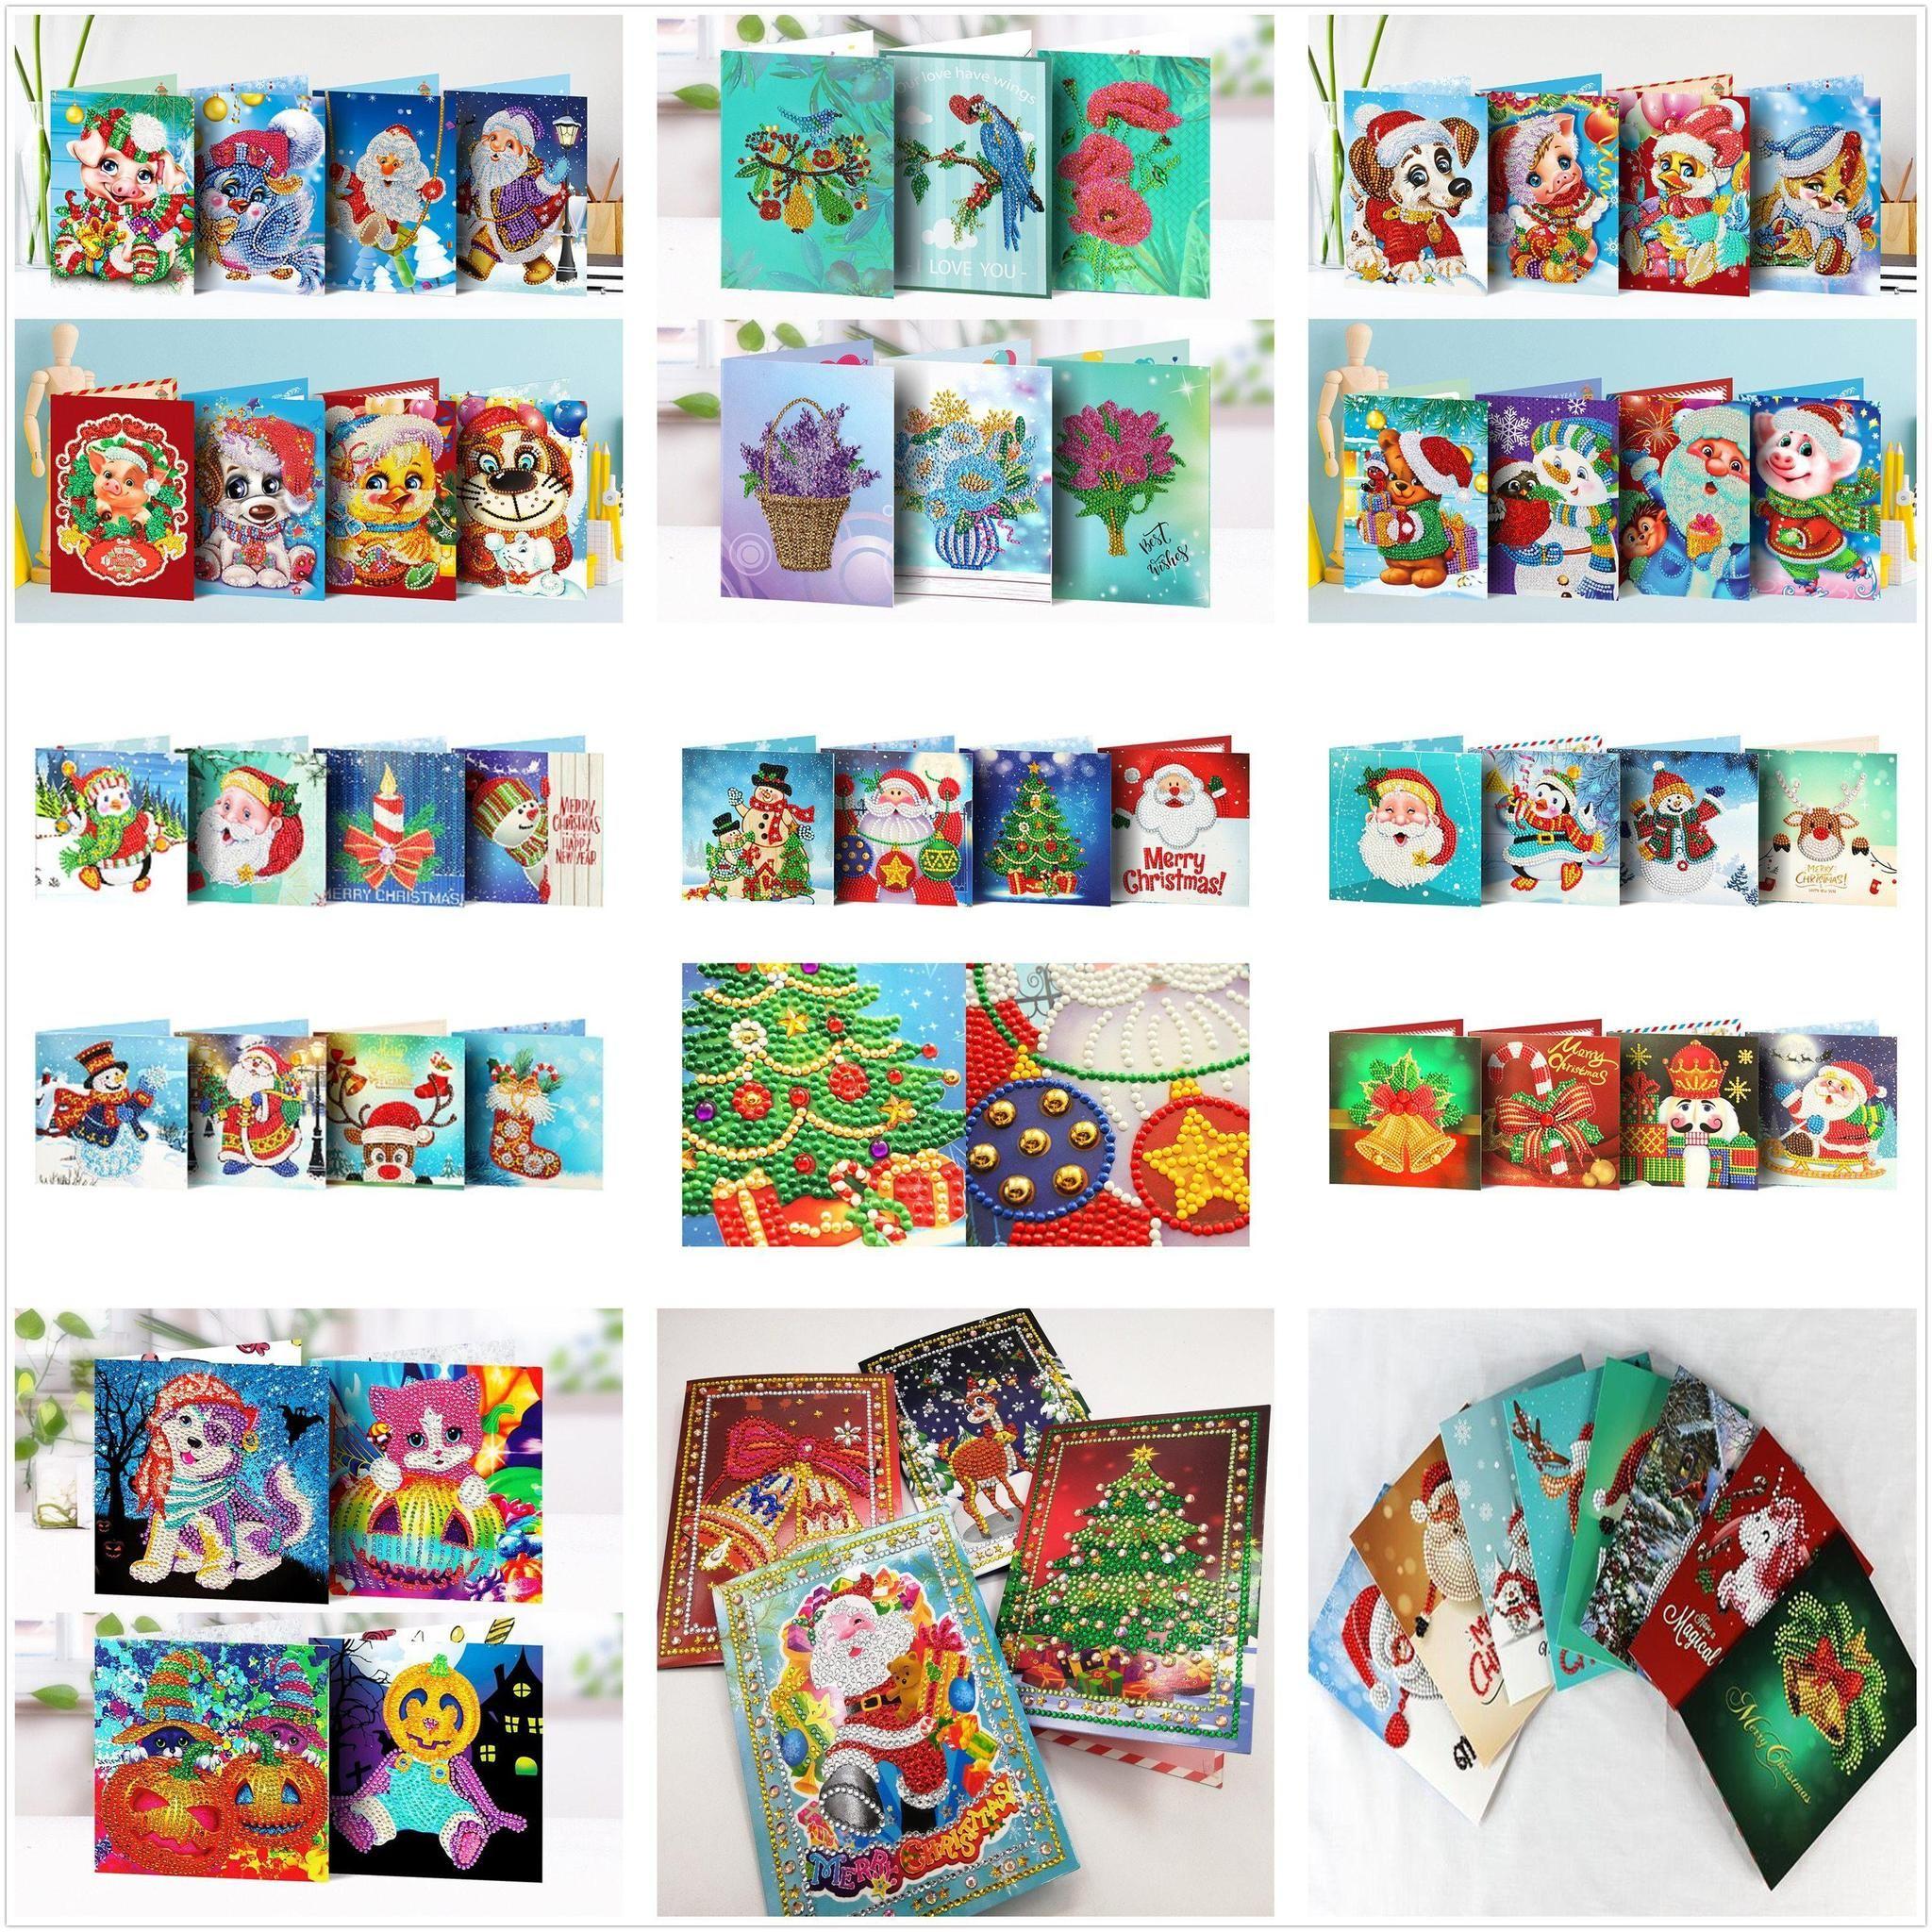 5d diy diamond painting christmas cards 4pcs cross stitch